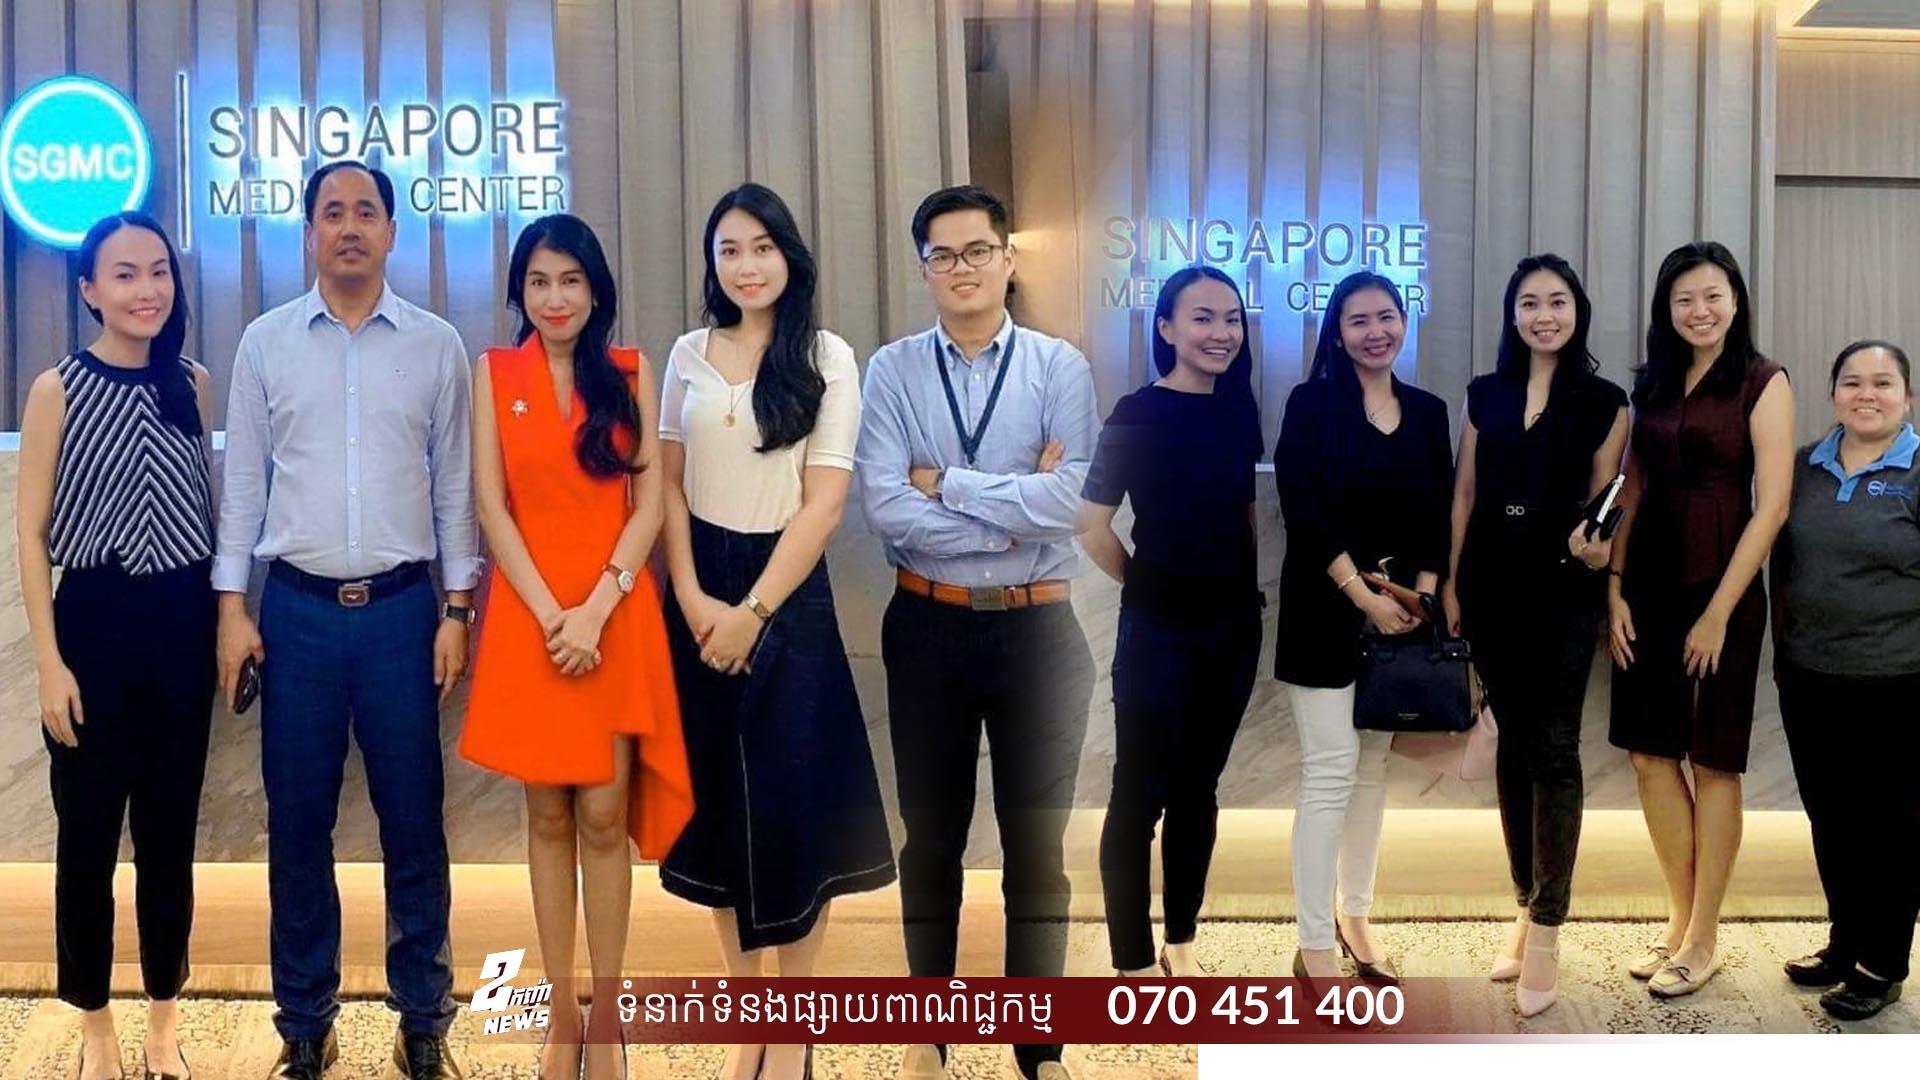 VAAC និង Singapore Medical Center  ចុះកិច្ចព្រមព្រៀងពាណិជ្ជកម្មសេវាយន្តហោះសង្រ្គាះបន្ទាន់